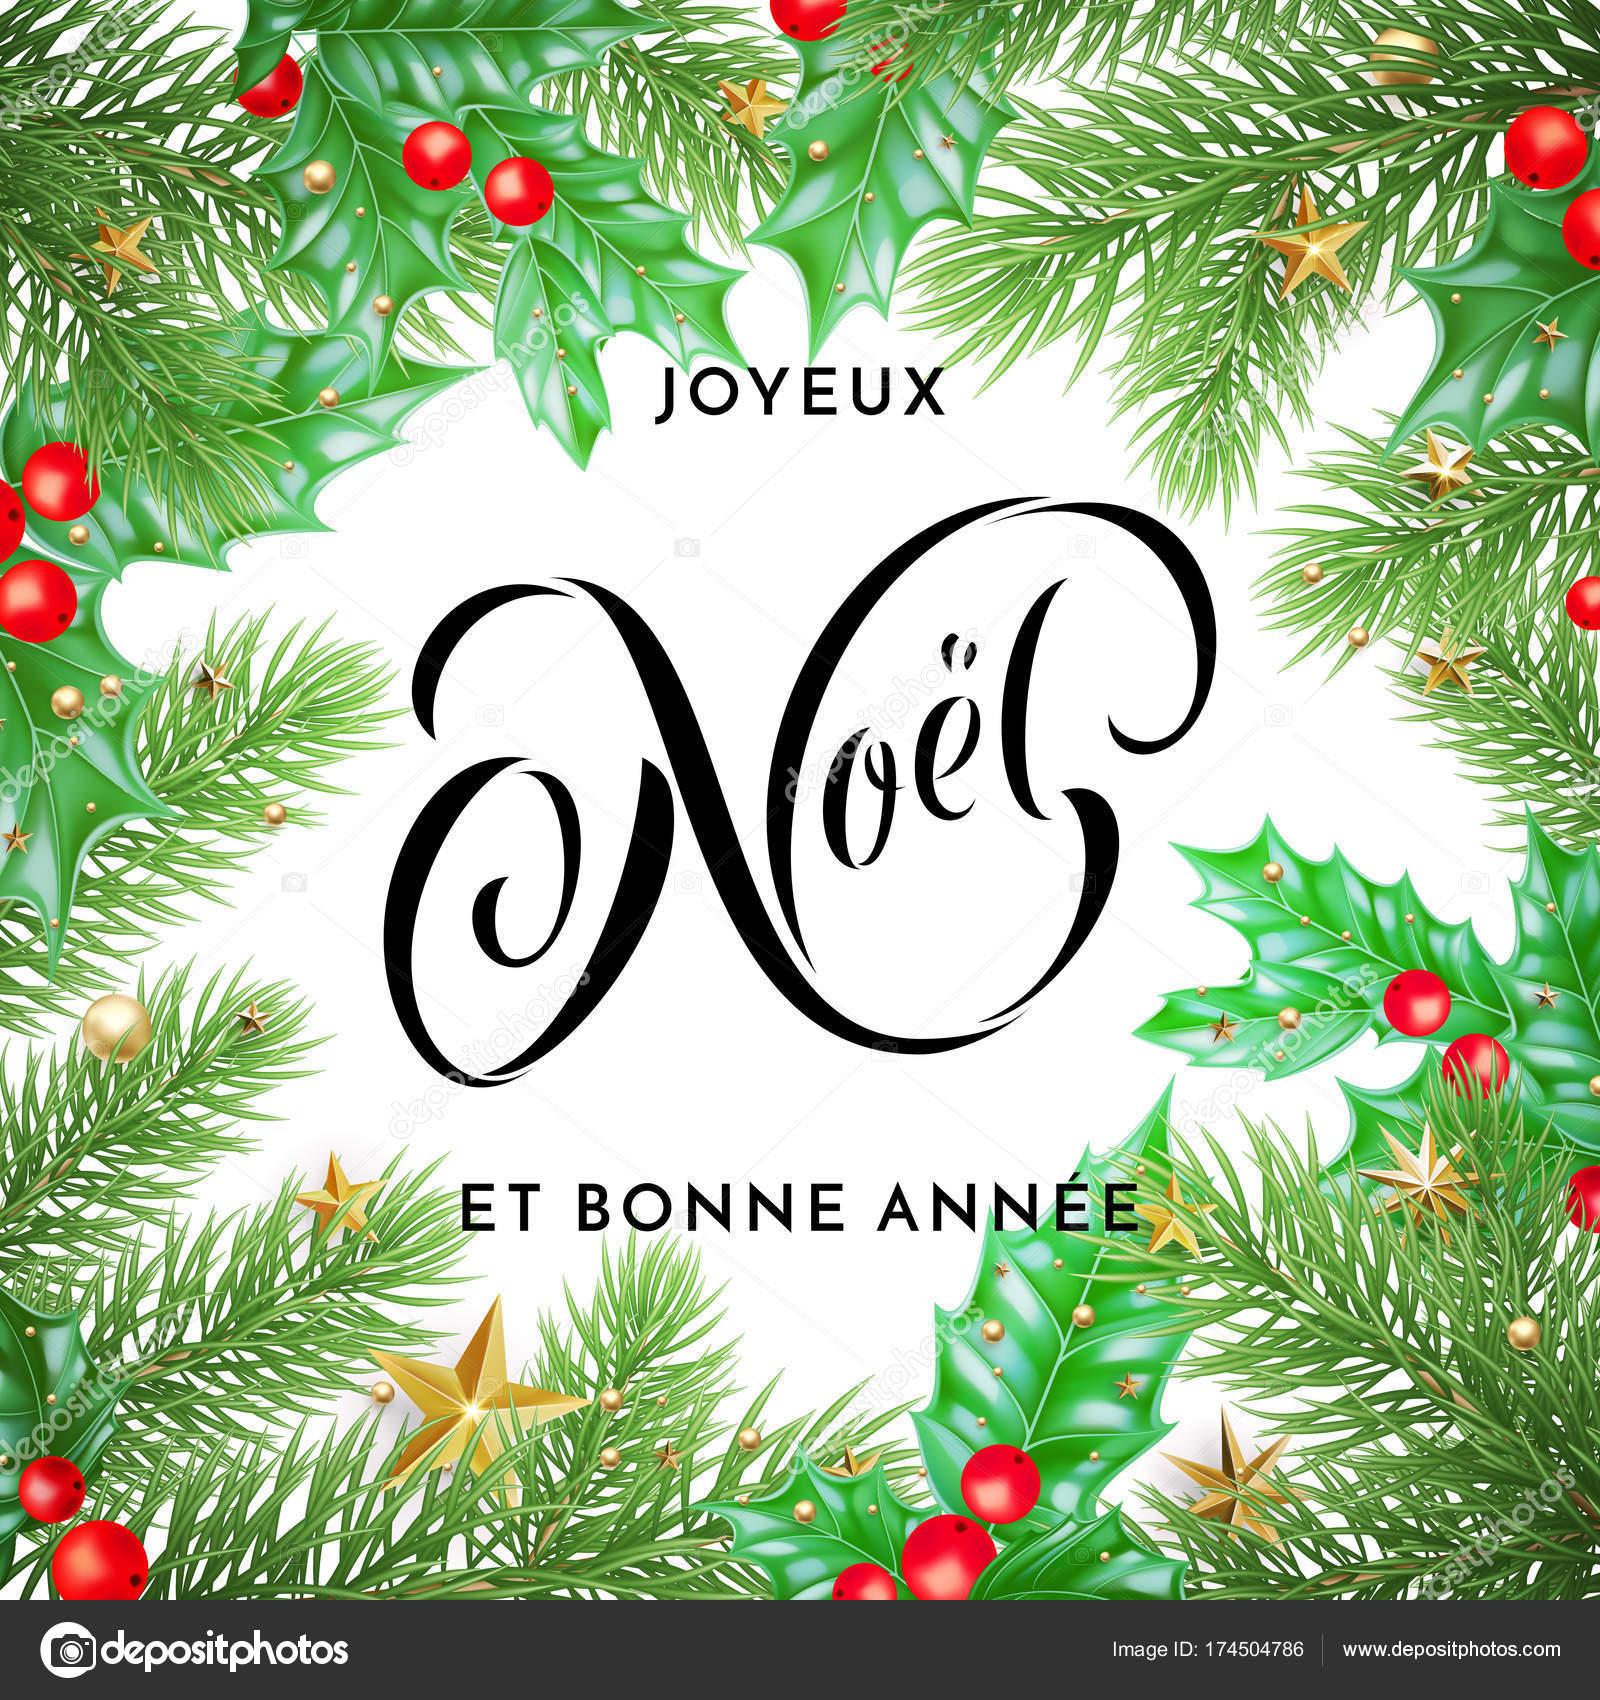 Joyeux Noel Et Nouvel An.Joyeux Noel Francais Joyeux Noel Et Bonne Annee Nouvel An